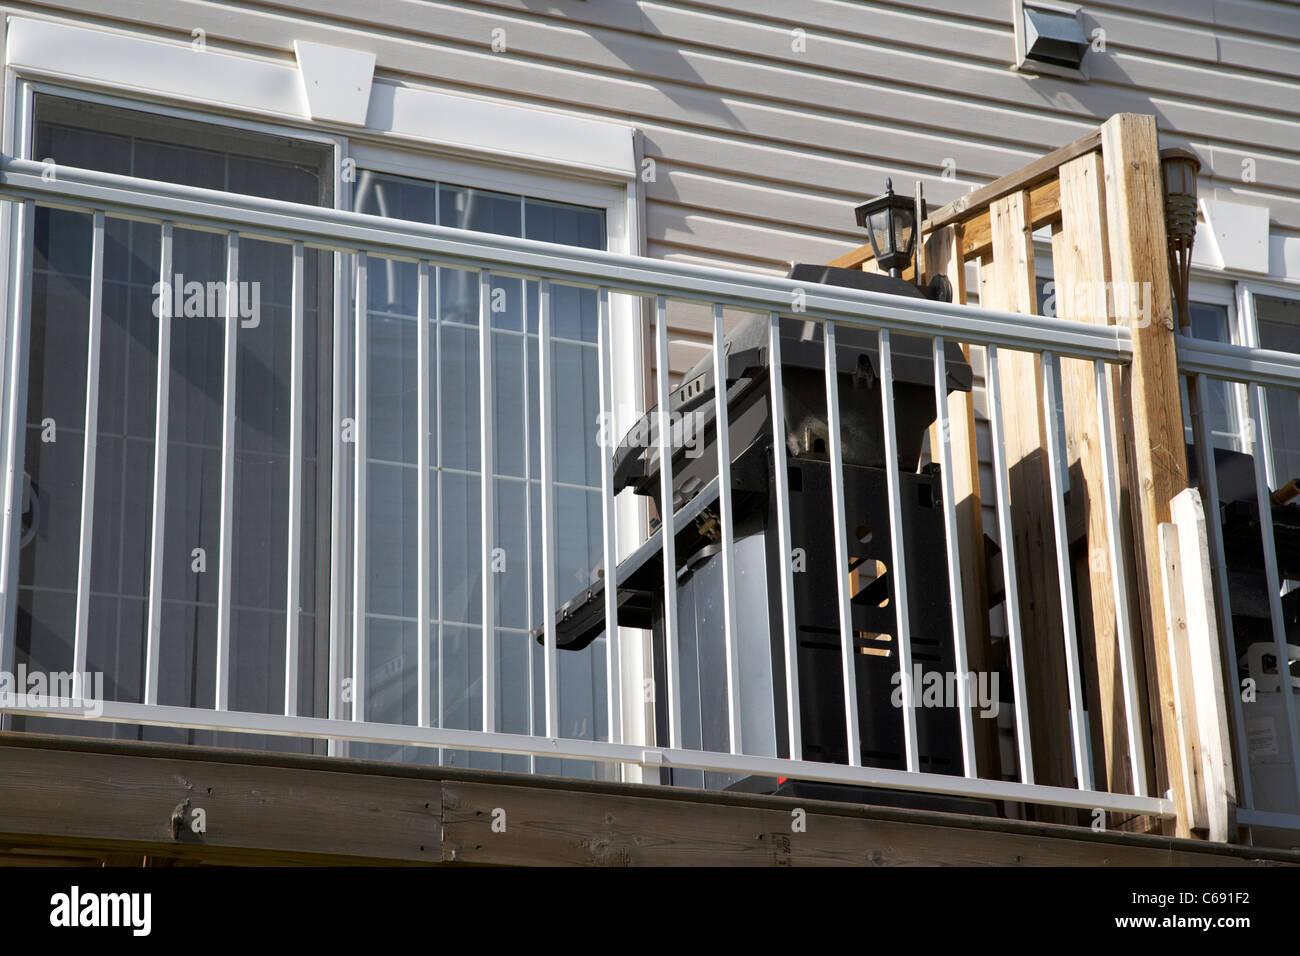 gas bbq on balcony of townhouse in Saskatoon Saskatchewan Canada - Stock Image